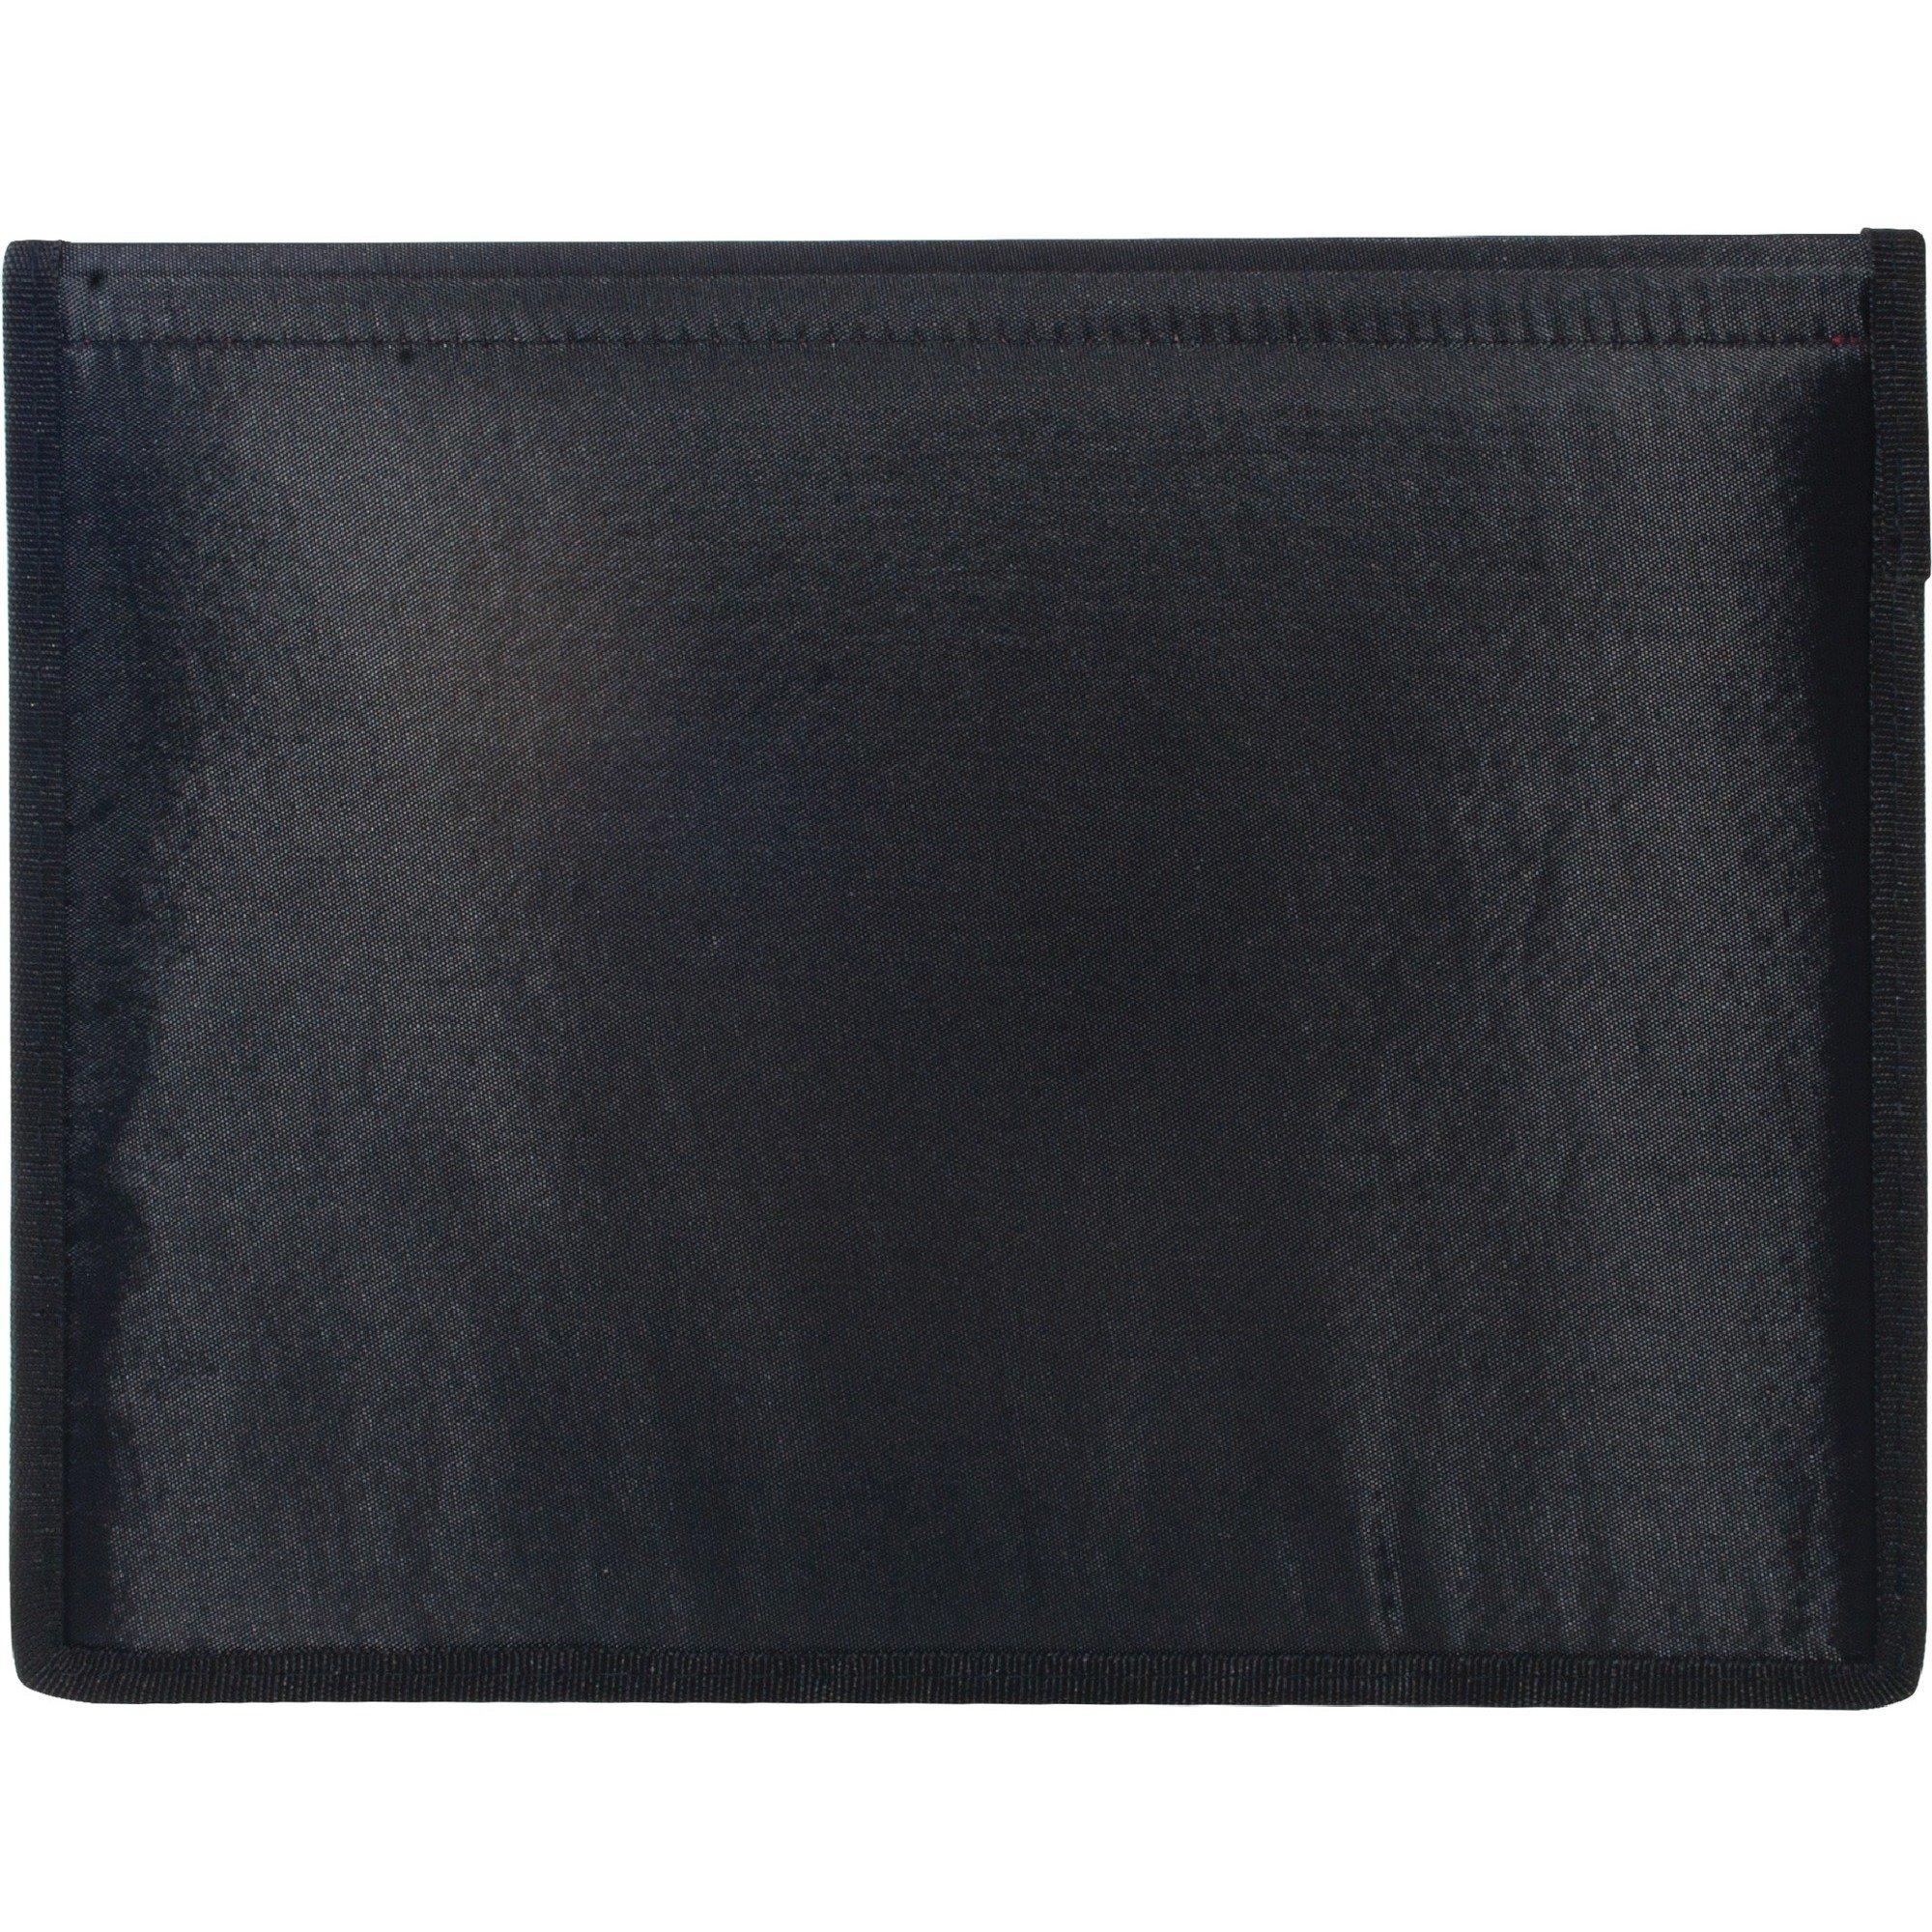 Robingift Anglers 204 Diploma/Certificate Holder 2 Pockets Vinyl 12''x9'' Black